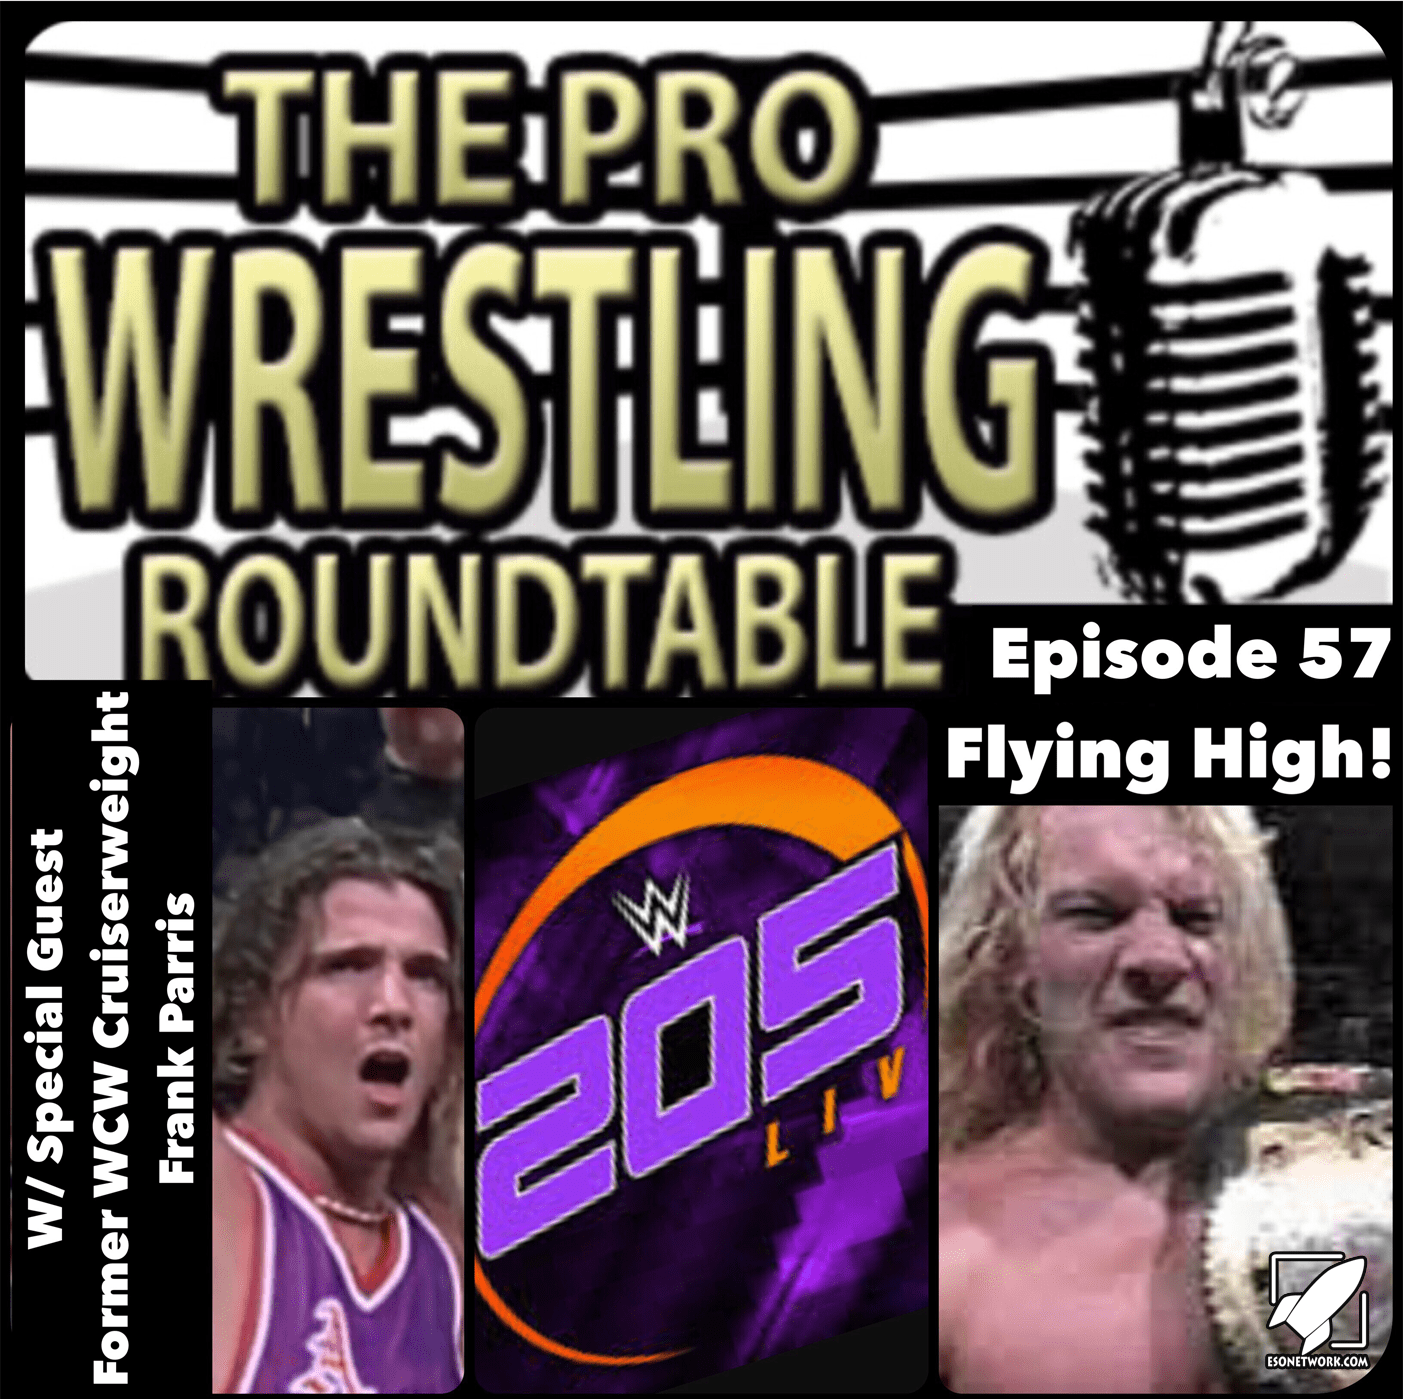 Pro Wrestling Roundtable Ep 57